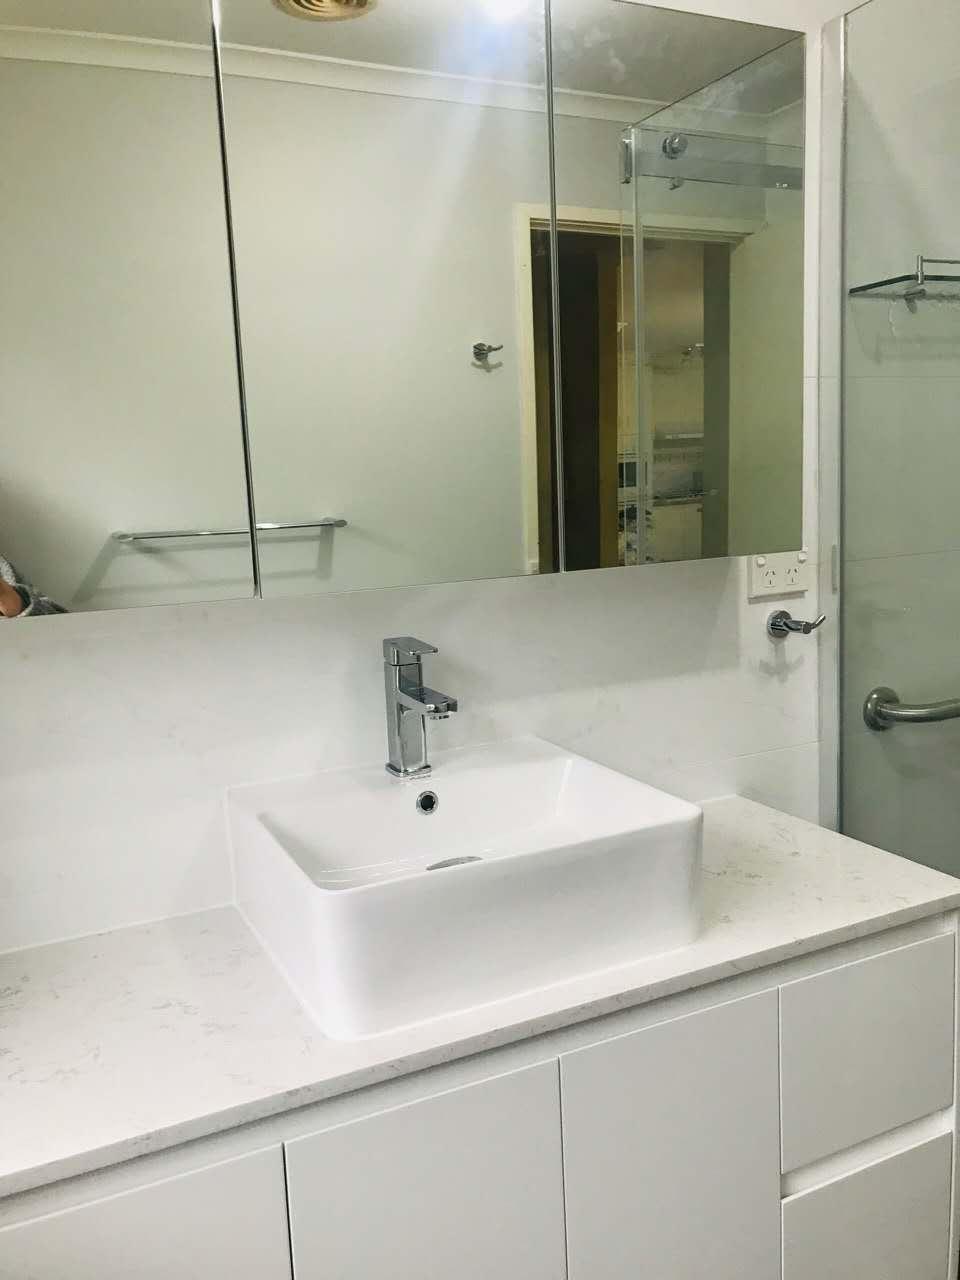 Kanye West spent $85k on photo of Whitney Houston\'s drug-strewn bathroom for album cover  -  wall mount bathroom sink vanity